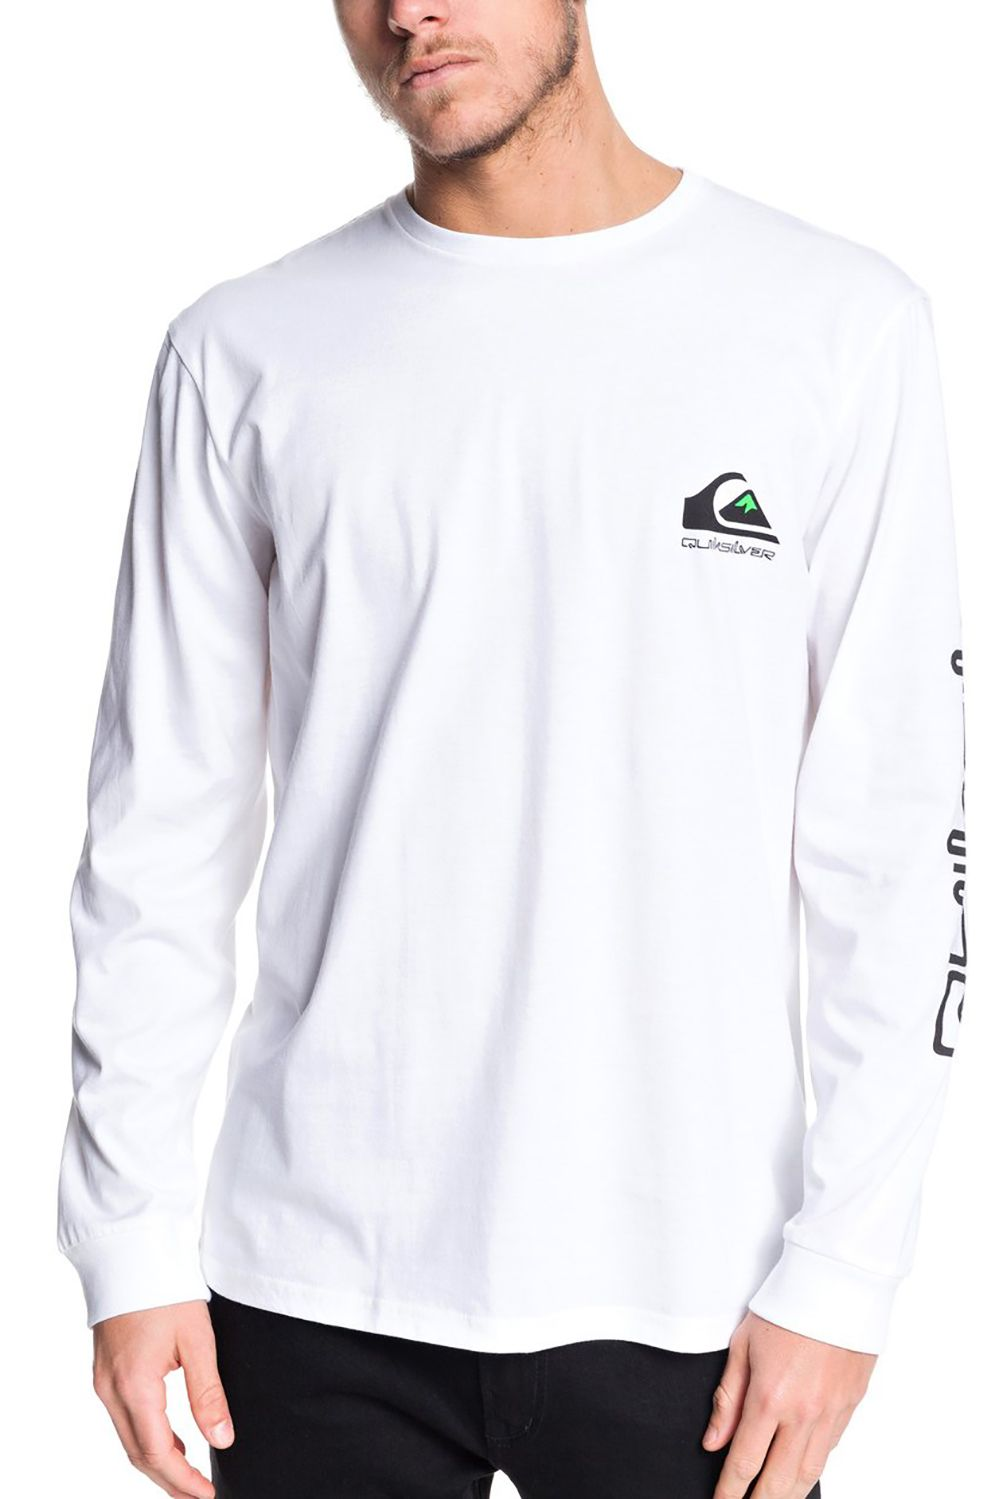 L-Sleeve Quiksilver OMNI LOGO CLASSIC White